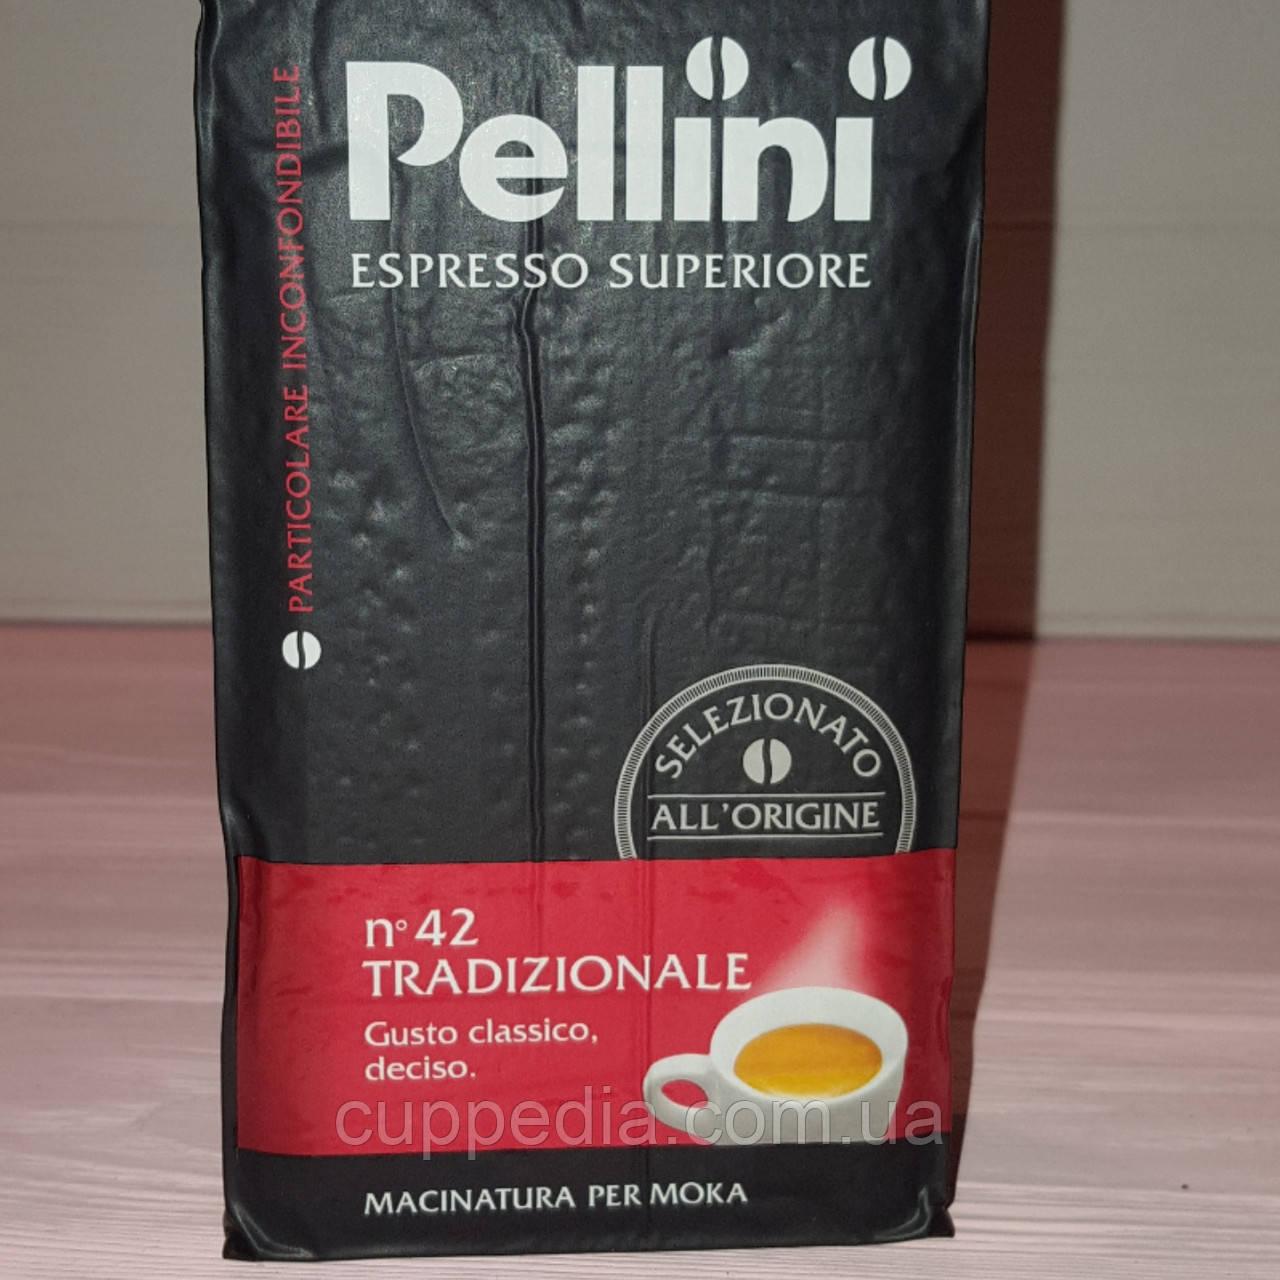 Молотый кофе  Pellini Espresso superiore 250 гр - Cuppedia в Одессе